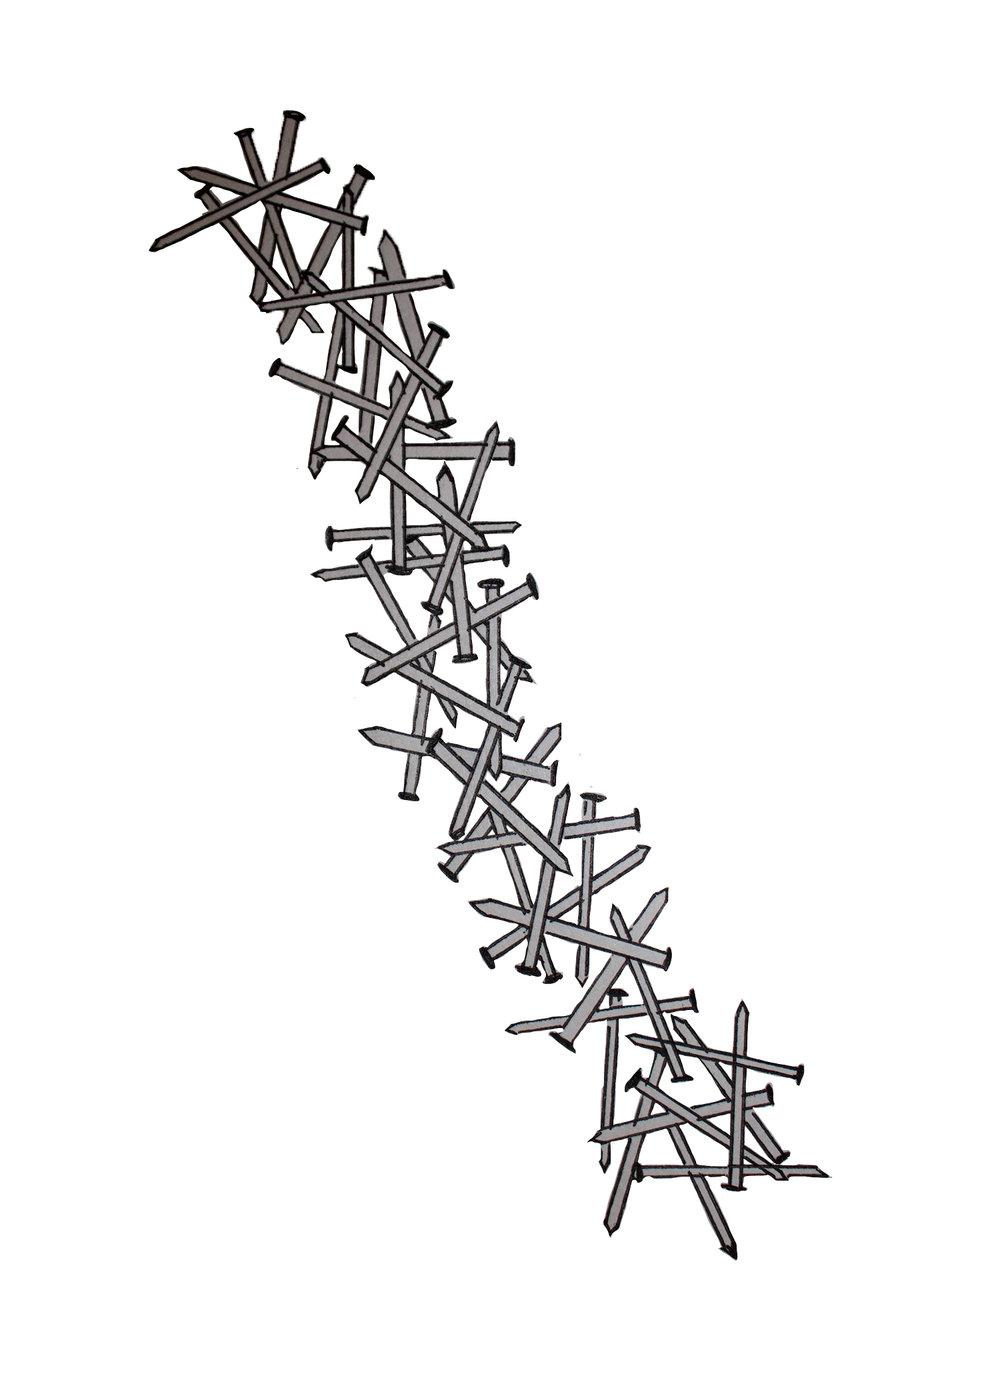 Preliminary Sketch (Nail configuration)